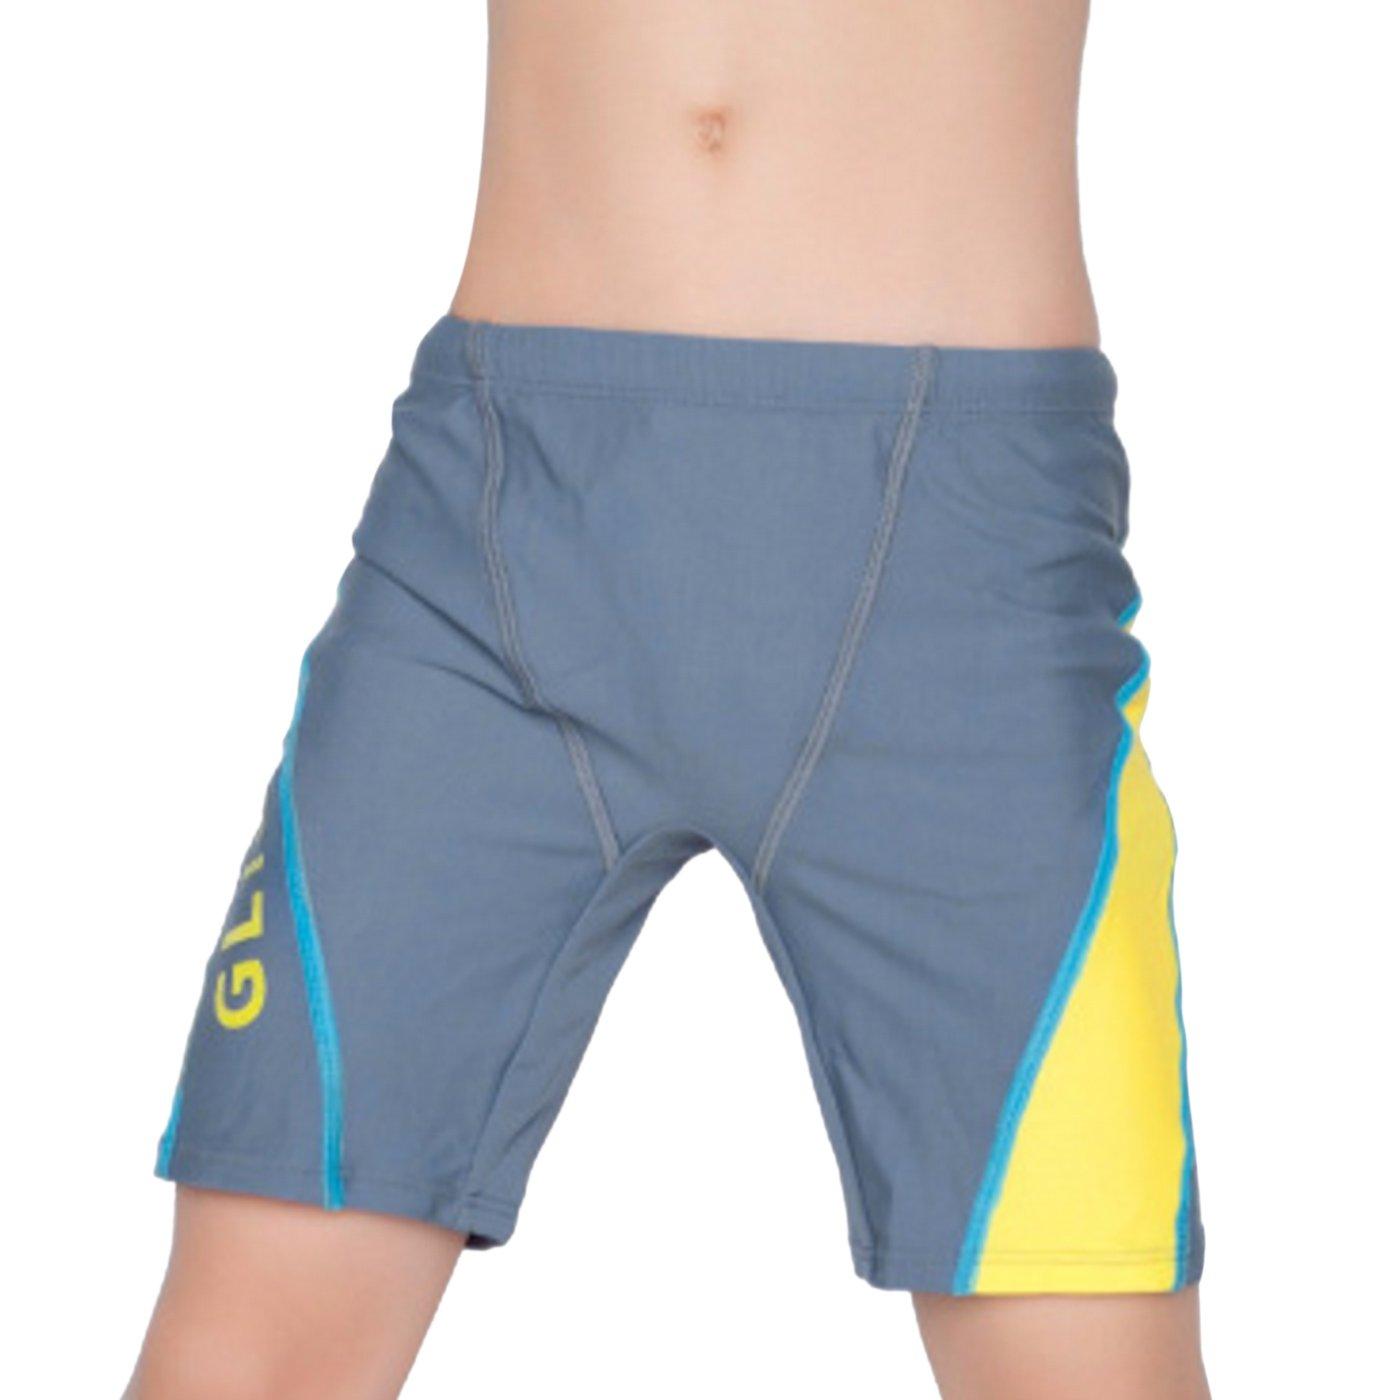 Aivtalk Boys Swiming Trunks UPF 50+ Sun Protective Boys Swim Shorts